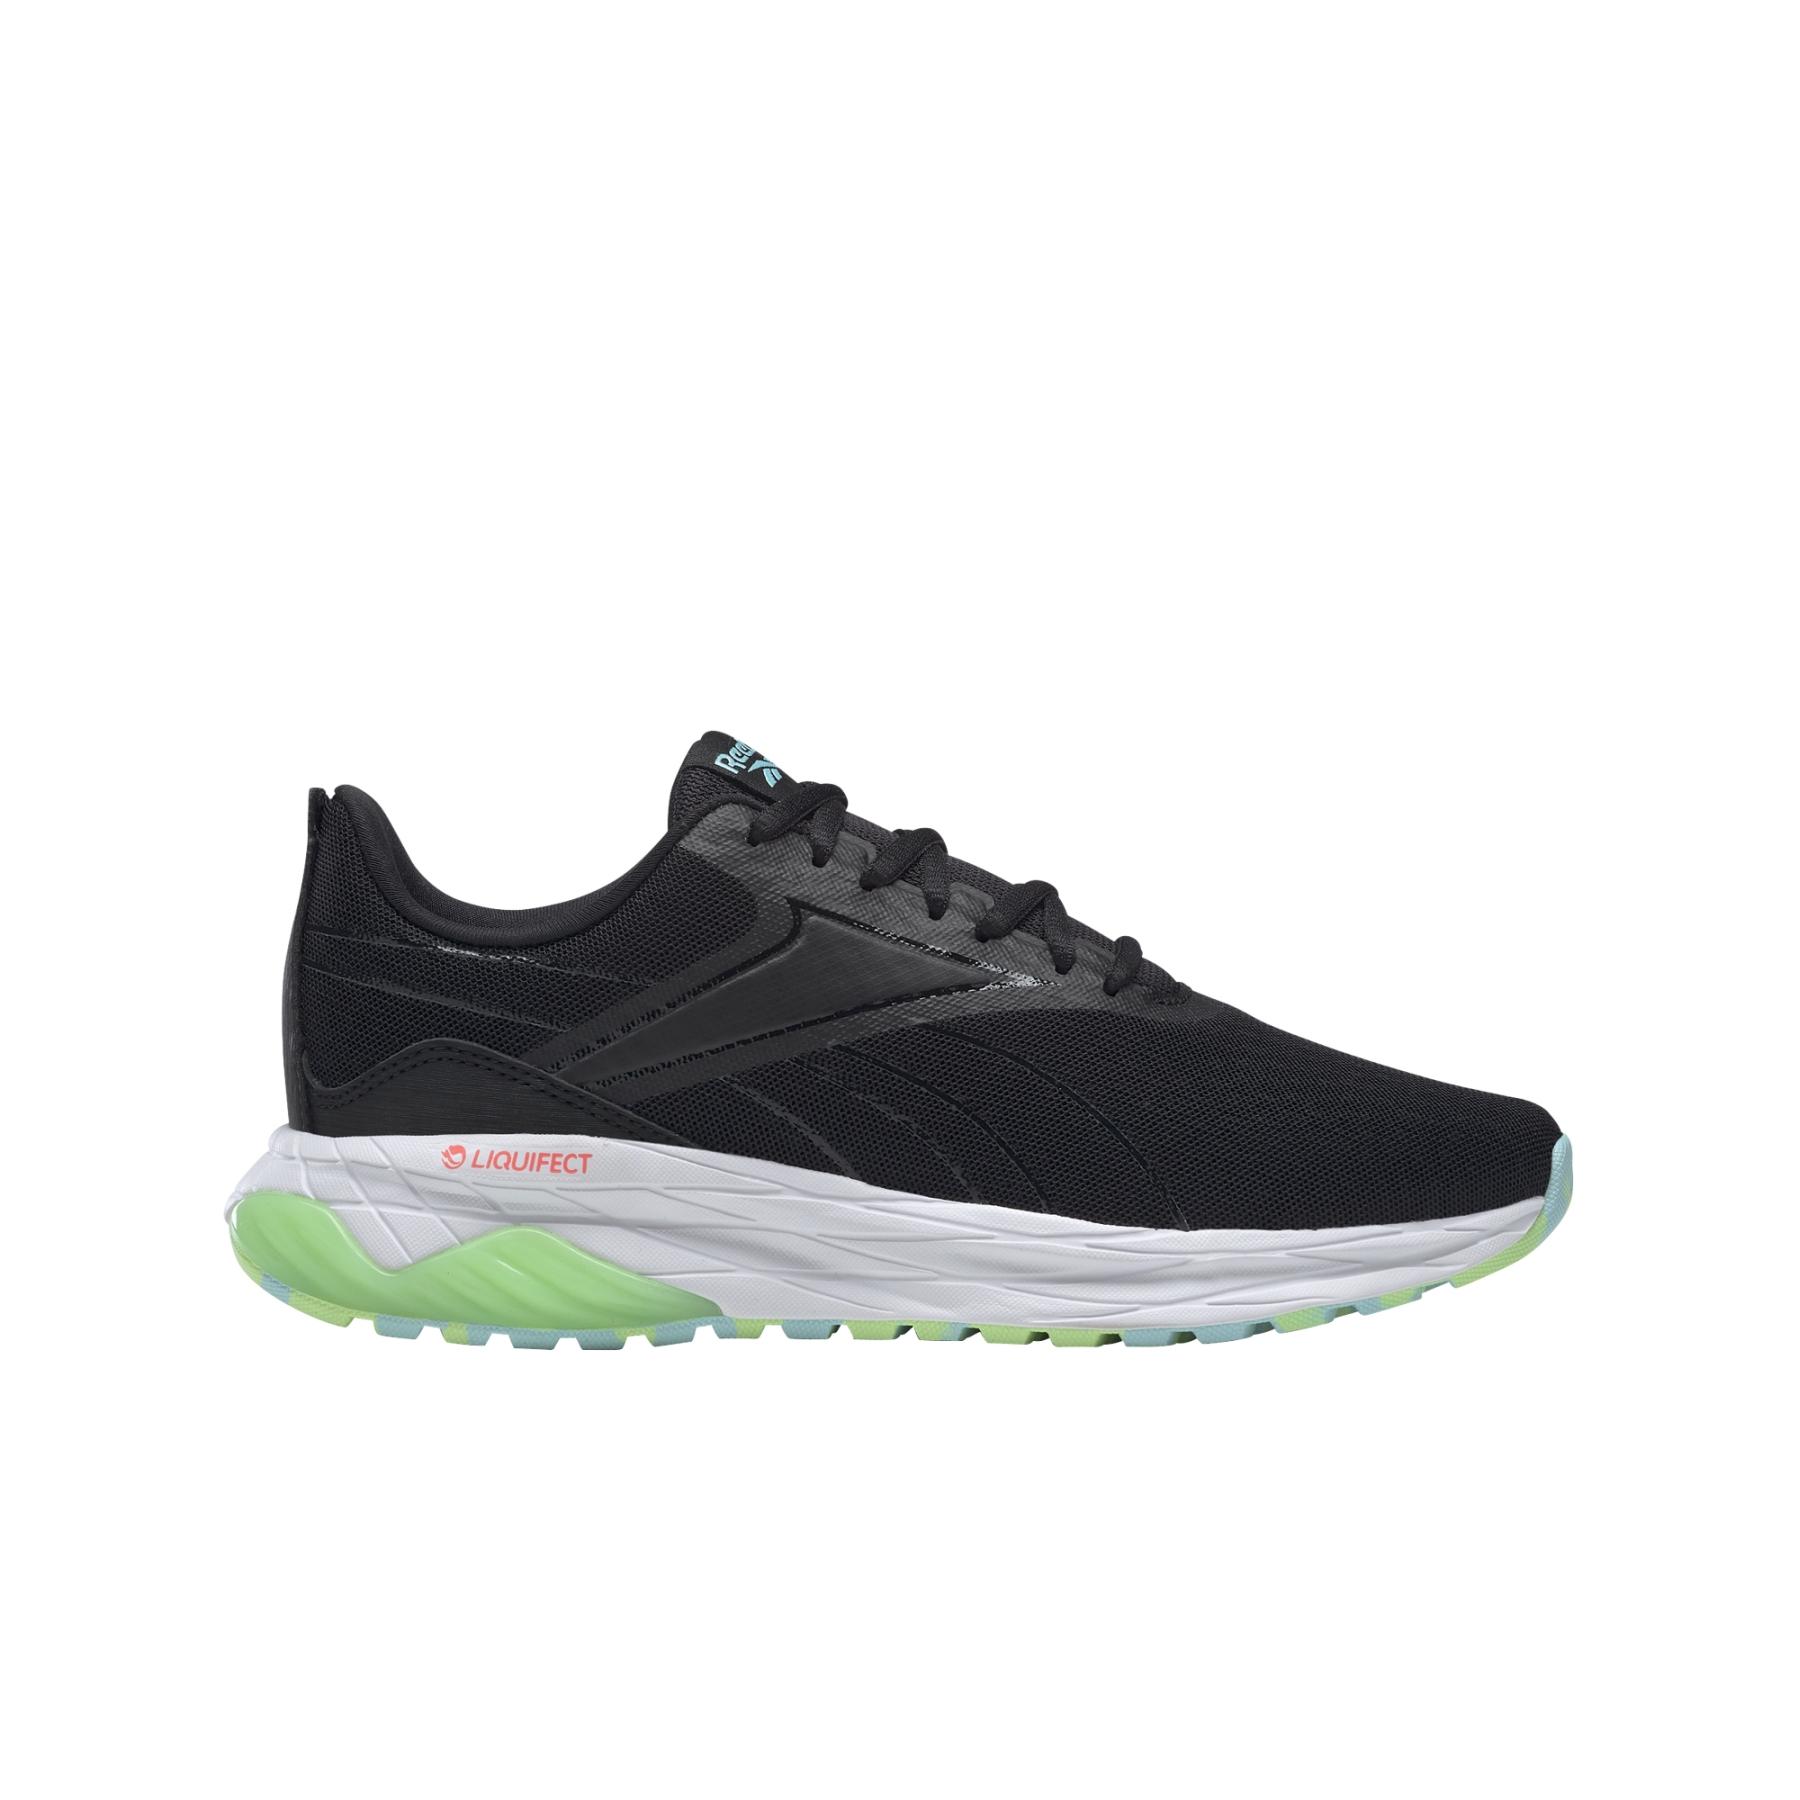 Reebok Liquifect 180 2.0 Zapatillas de correr para mujer - black/neon mint/orange flare FX1642